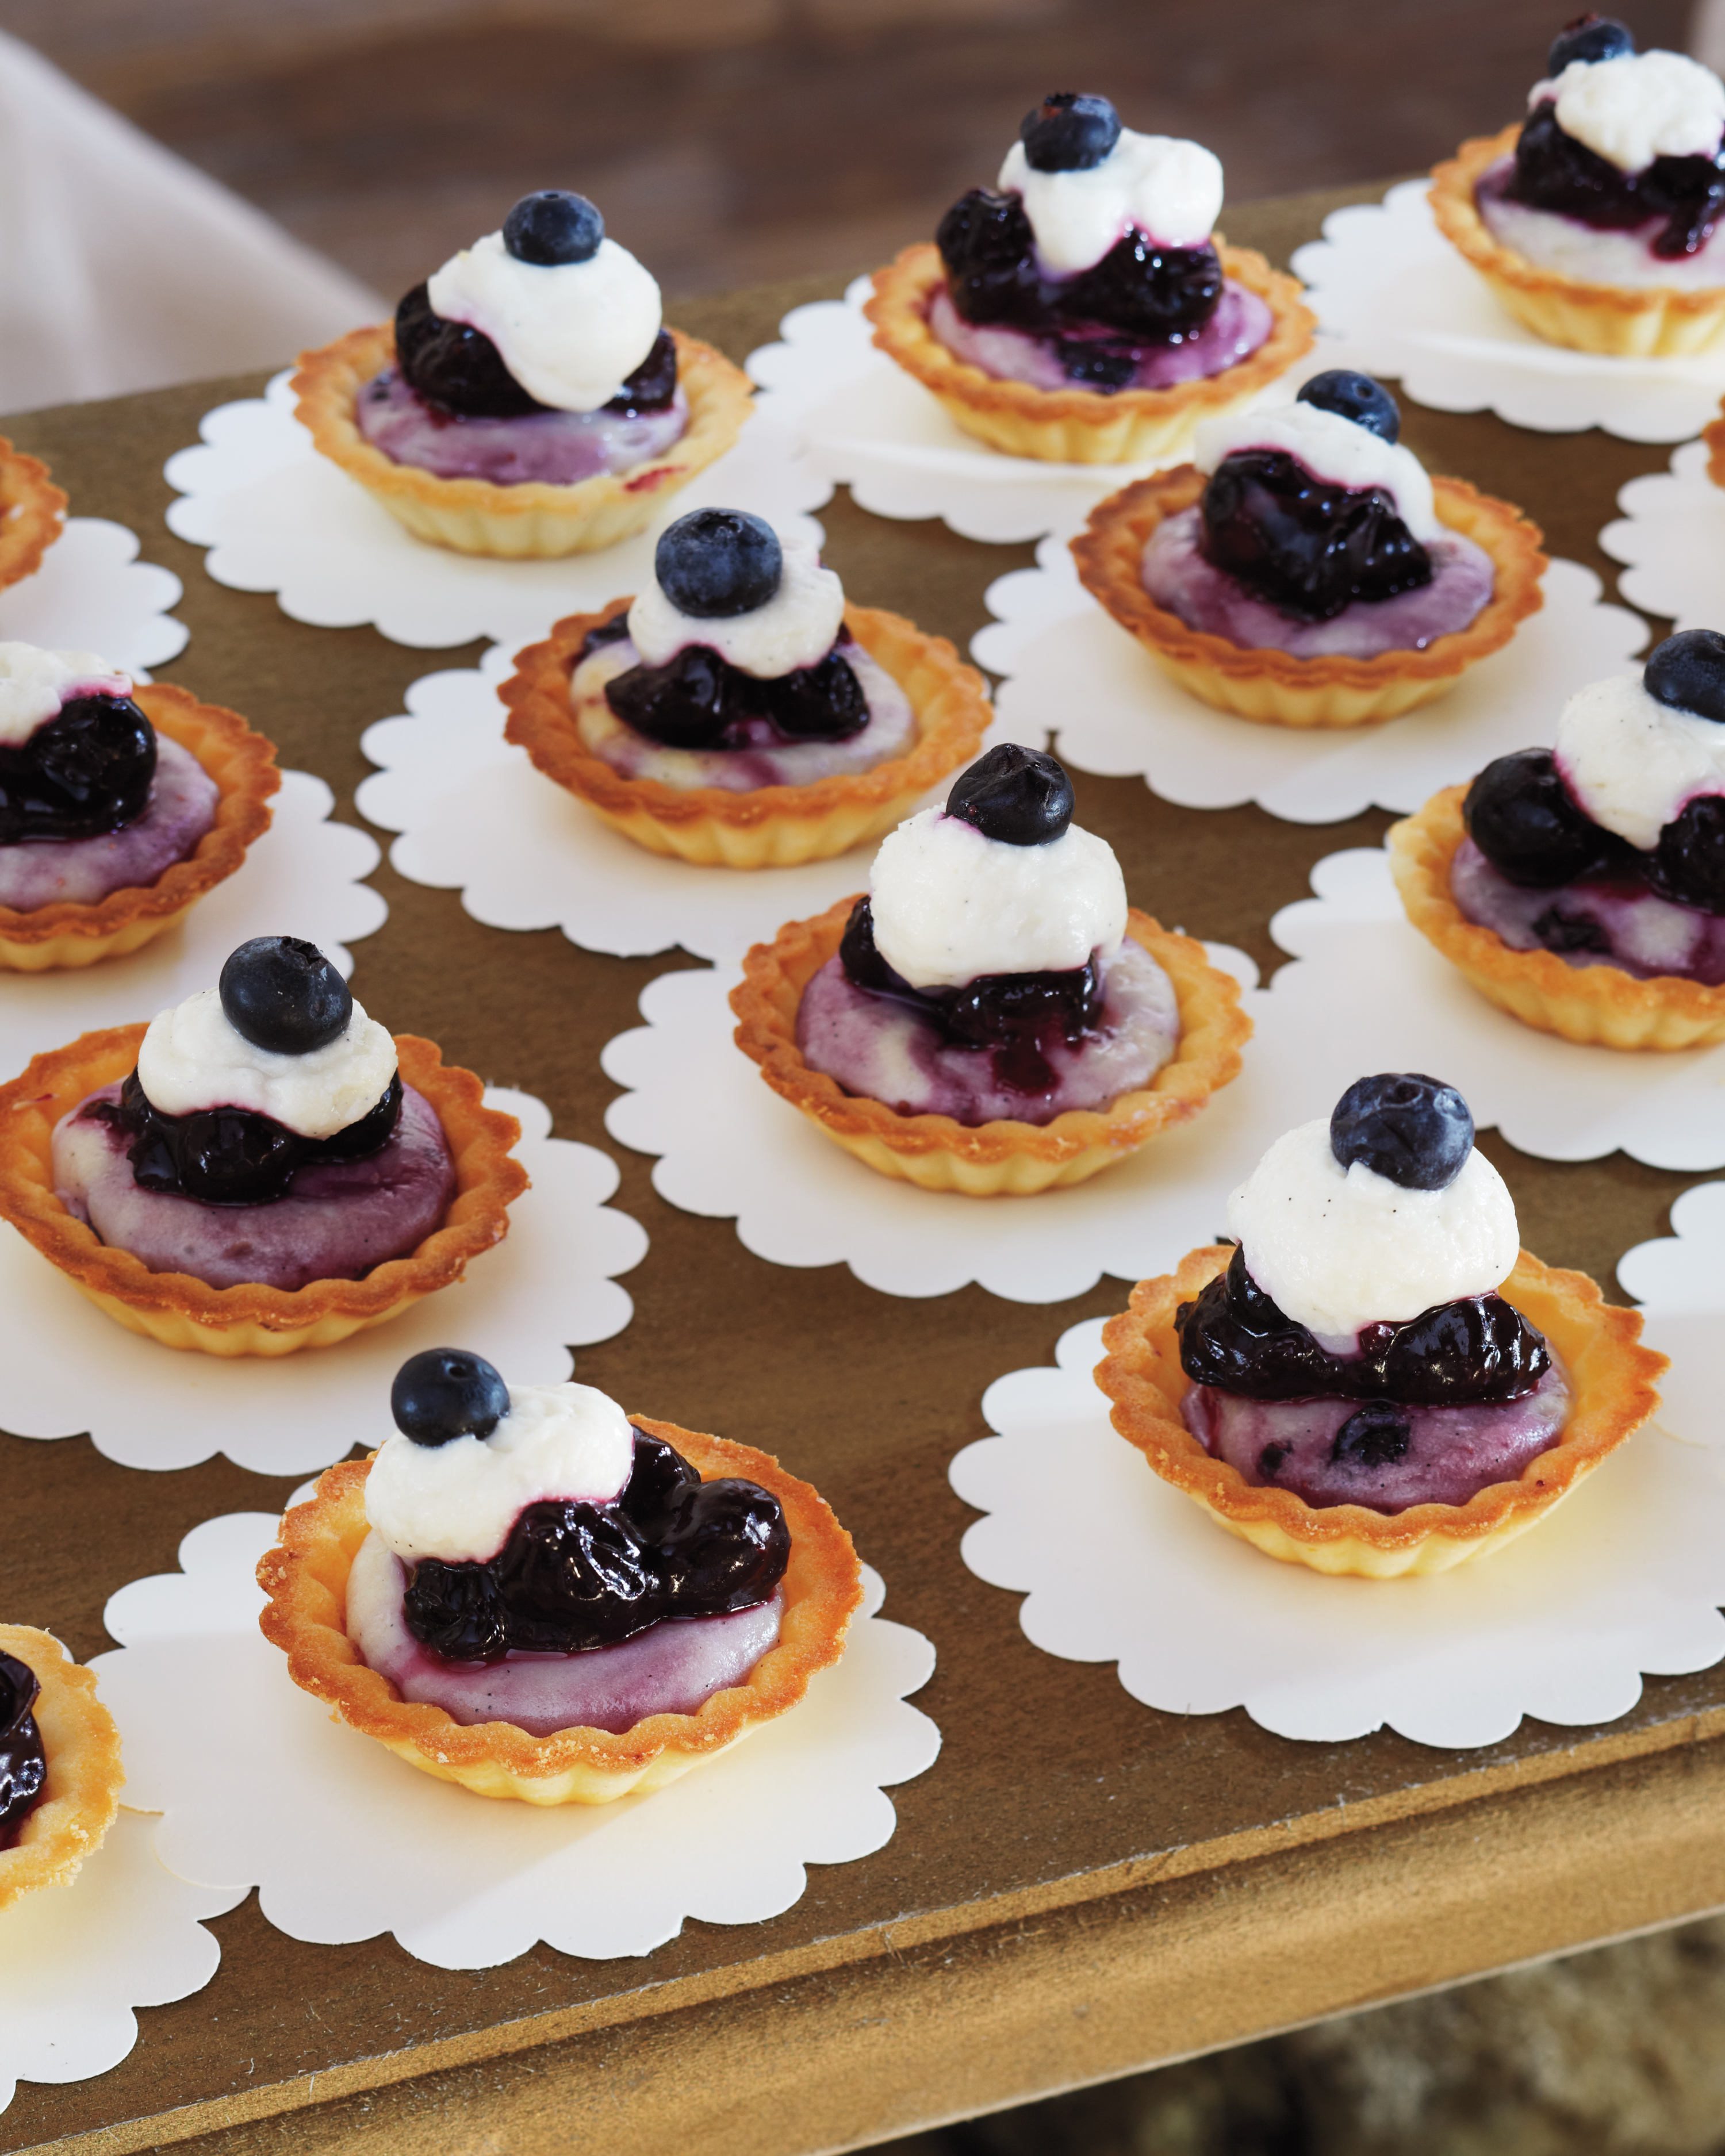 17 Wedding Cheesecake Ideas to Upgrade Your Dessert Bar